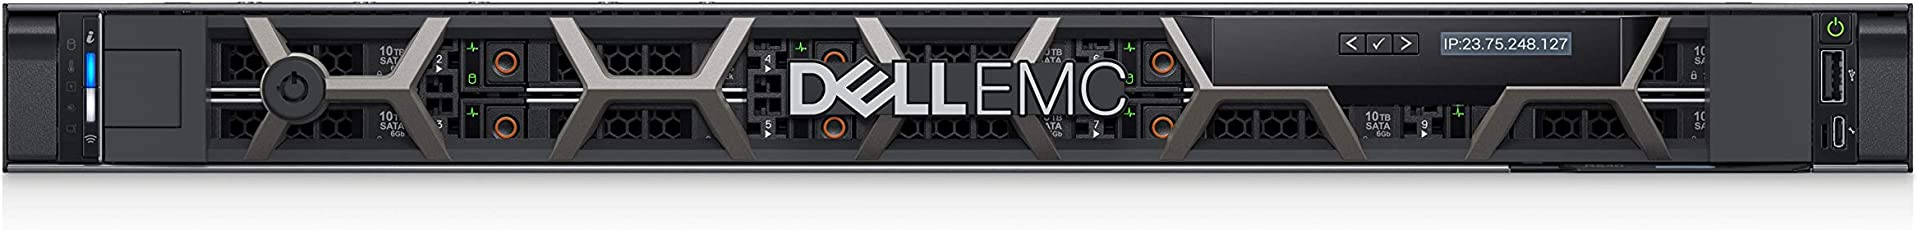 AWS Storage Gateway pre-loaded on a Dell EMC PowerEdge server